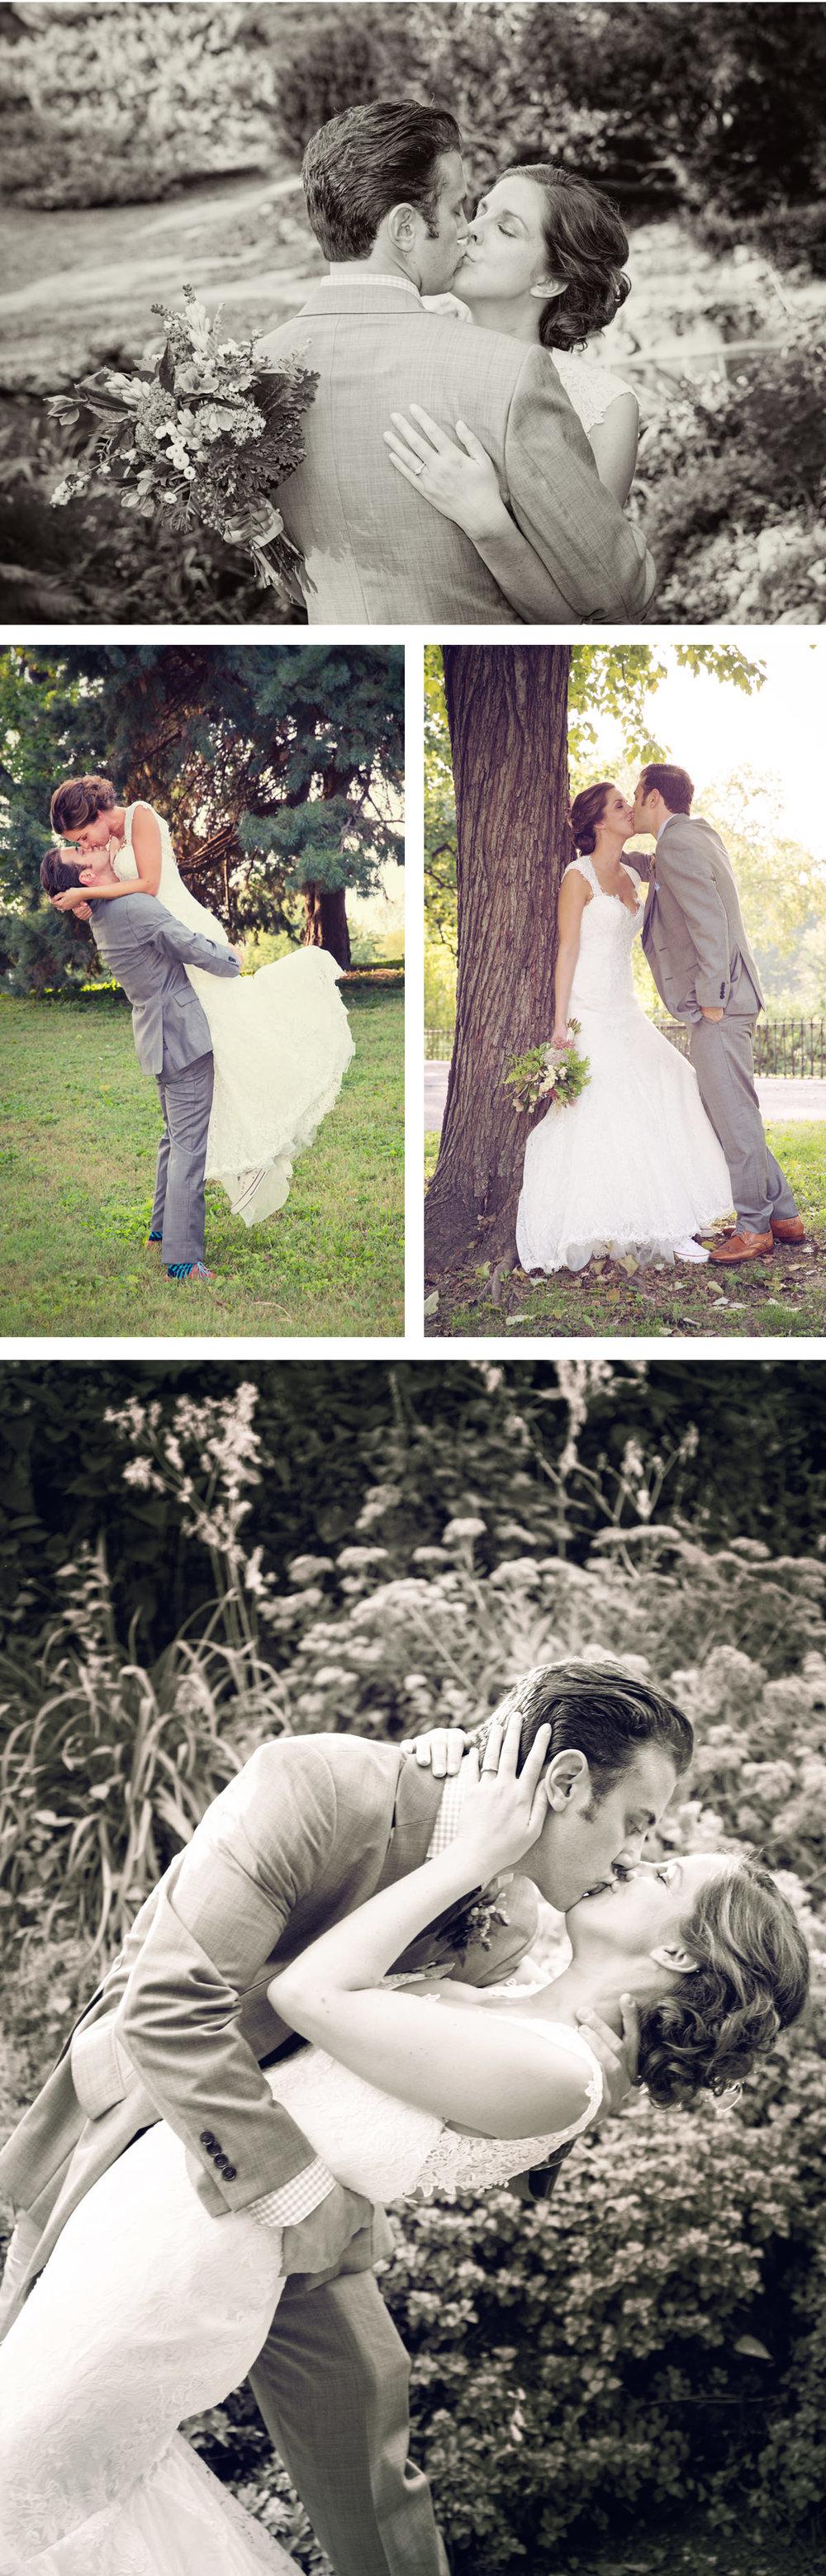 Mike_Danielle-bridegroom4.jpg